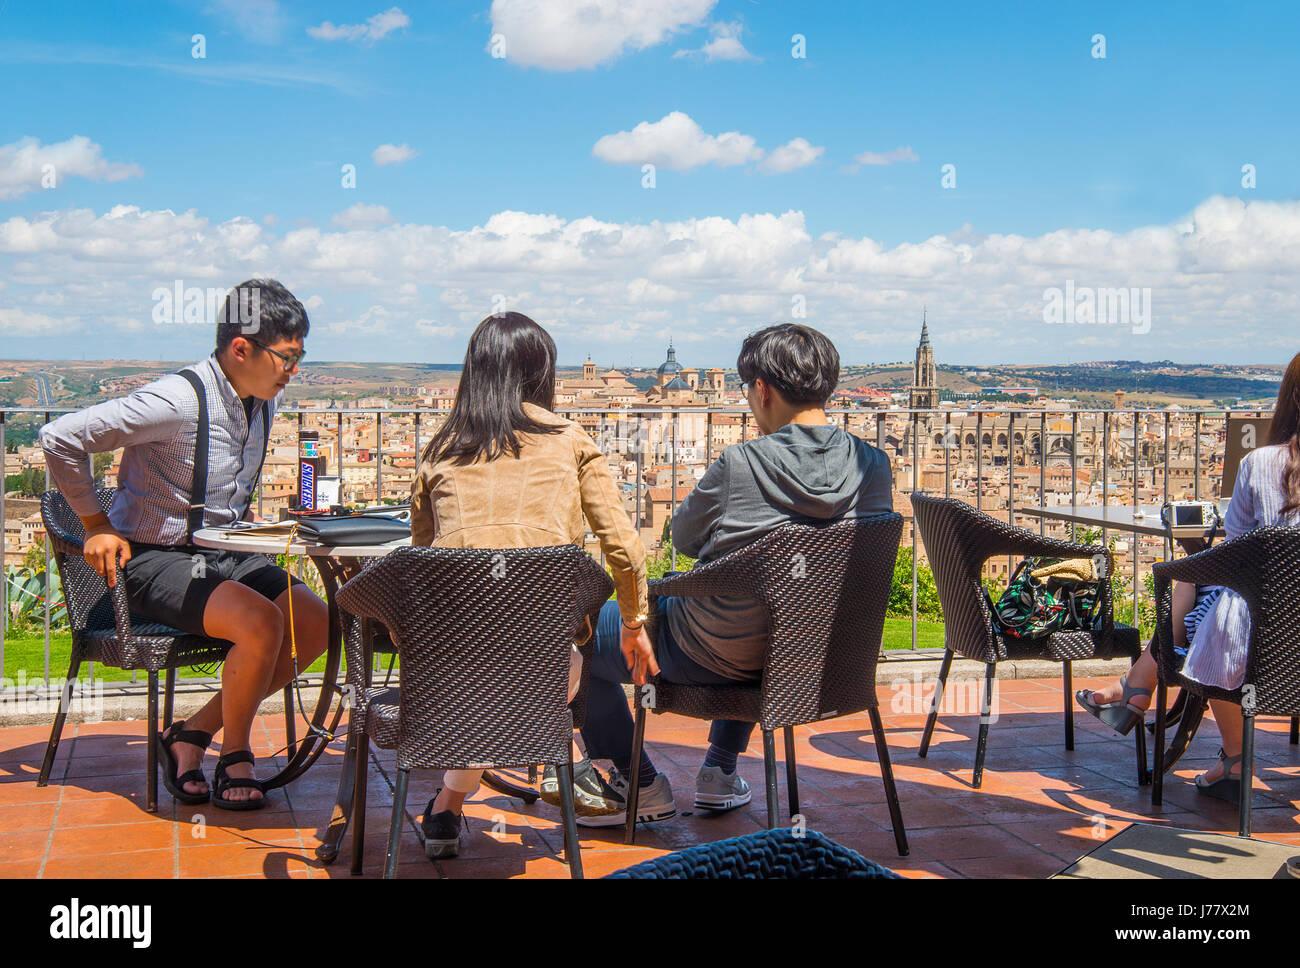 Japanese tourists at the viewpoint. Parador, Toledo, Castilla La Mancha, Spain. - Stock Image